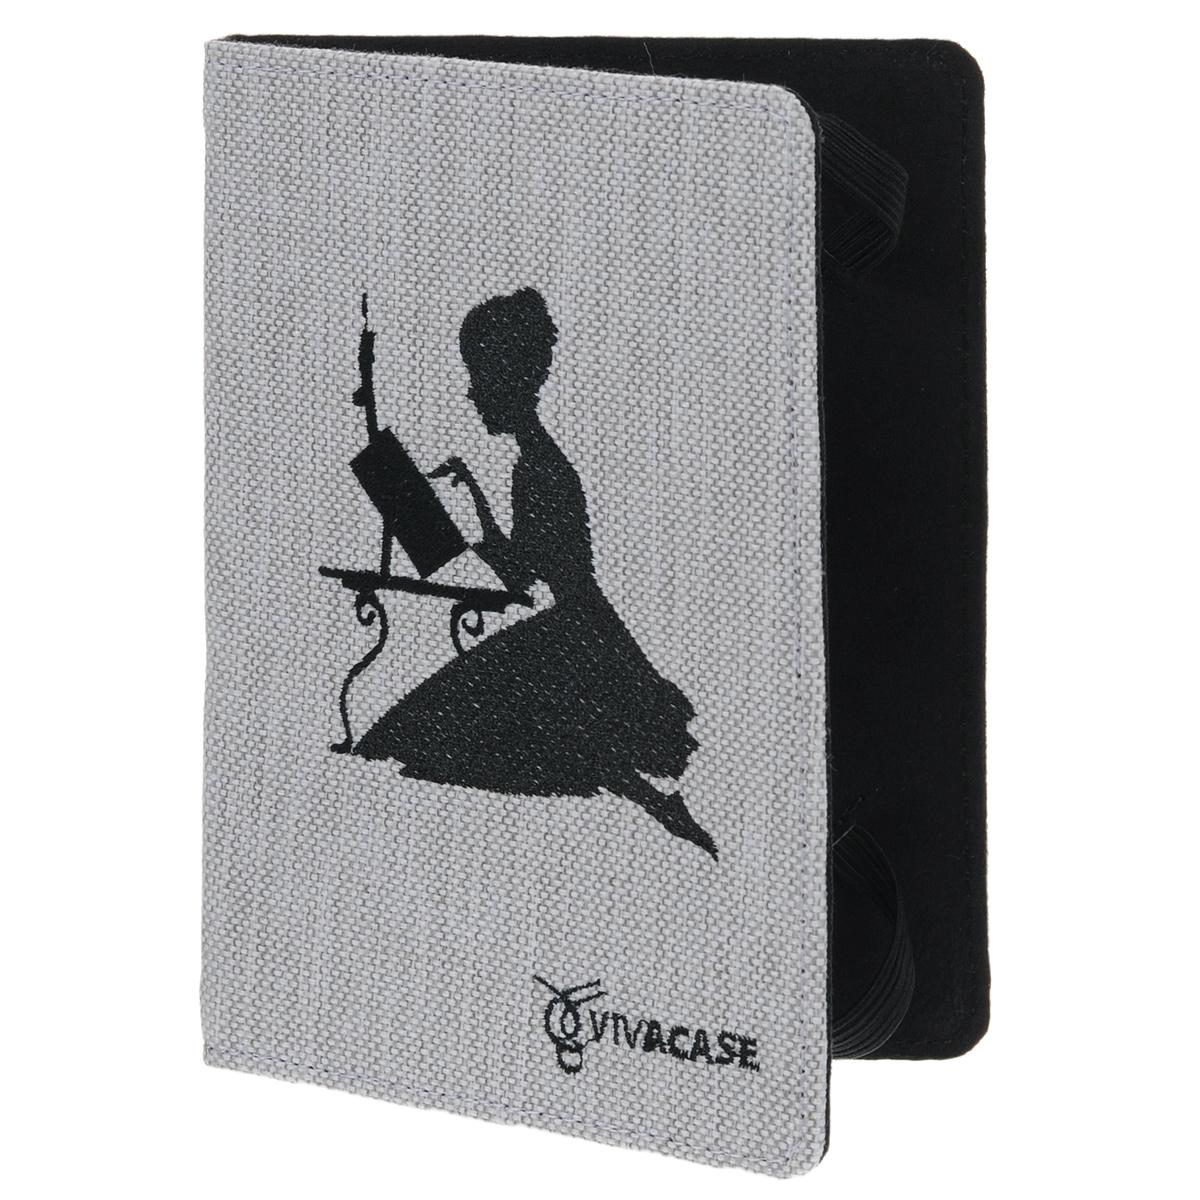 все цены на Vivacase Girl чехол для планшетов и e-book 6